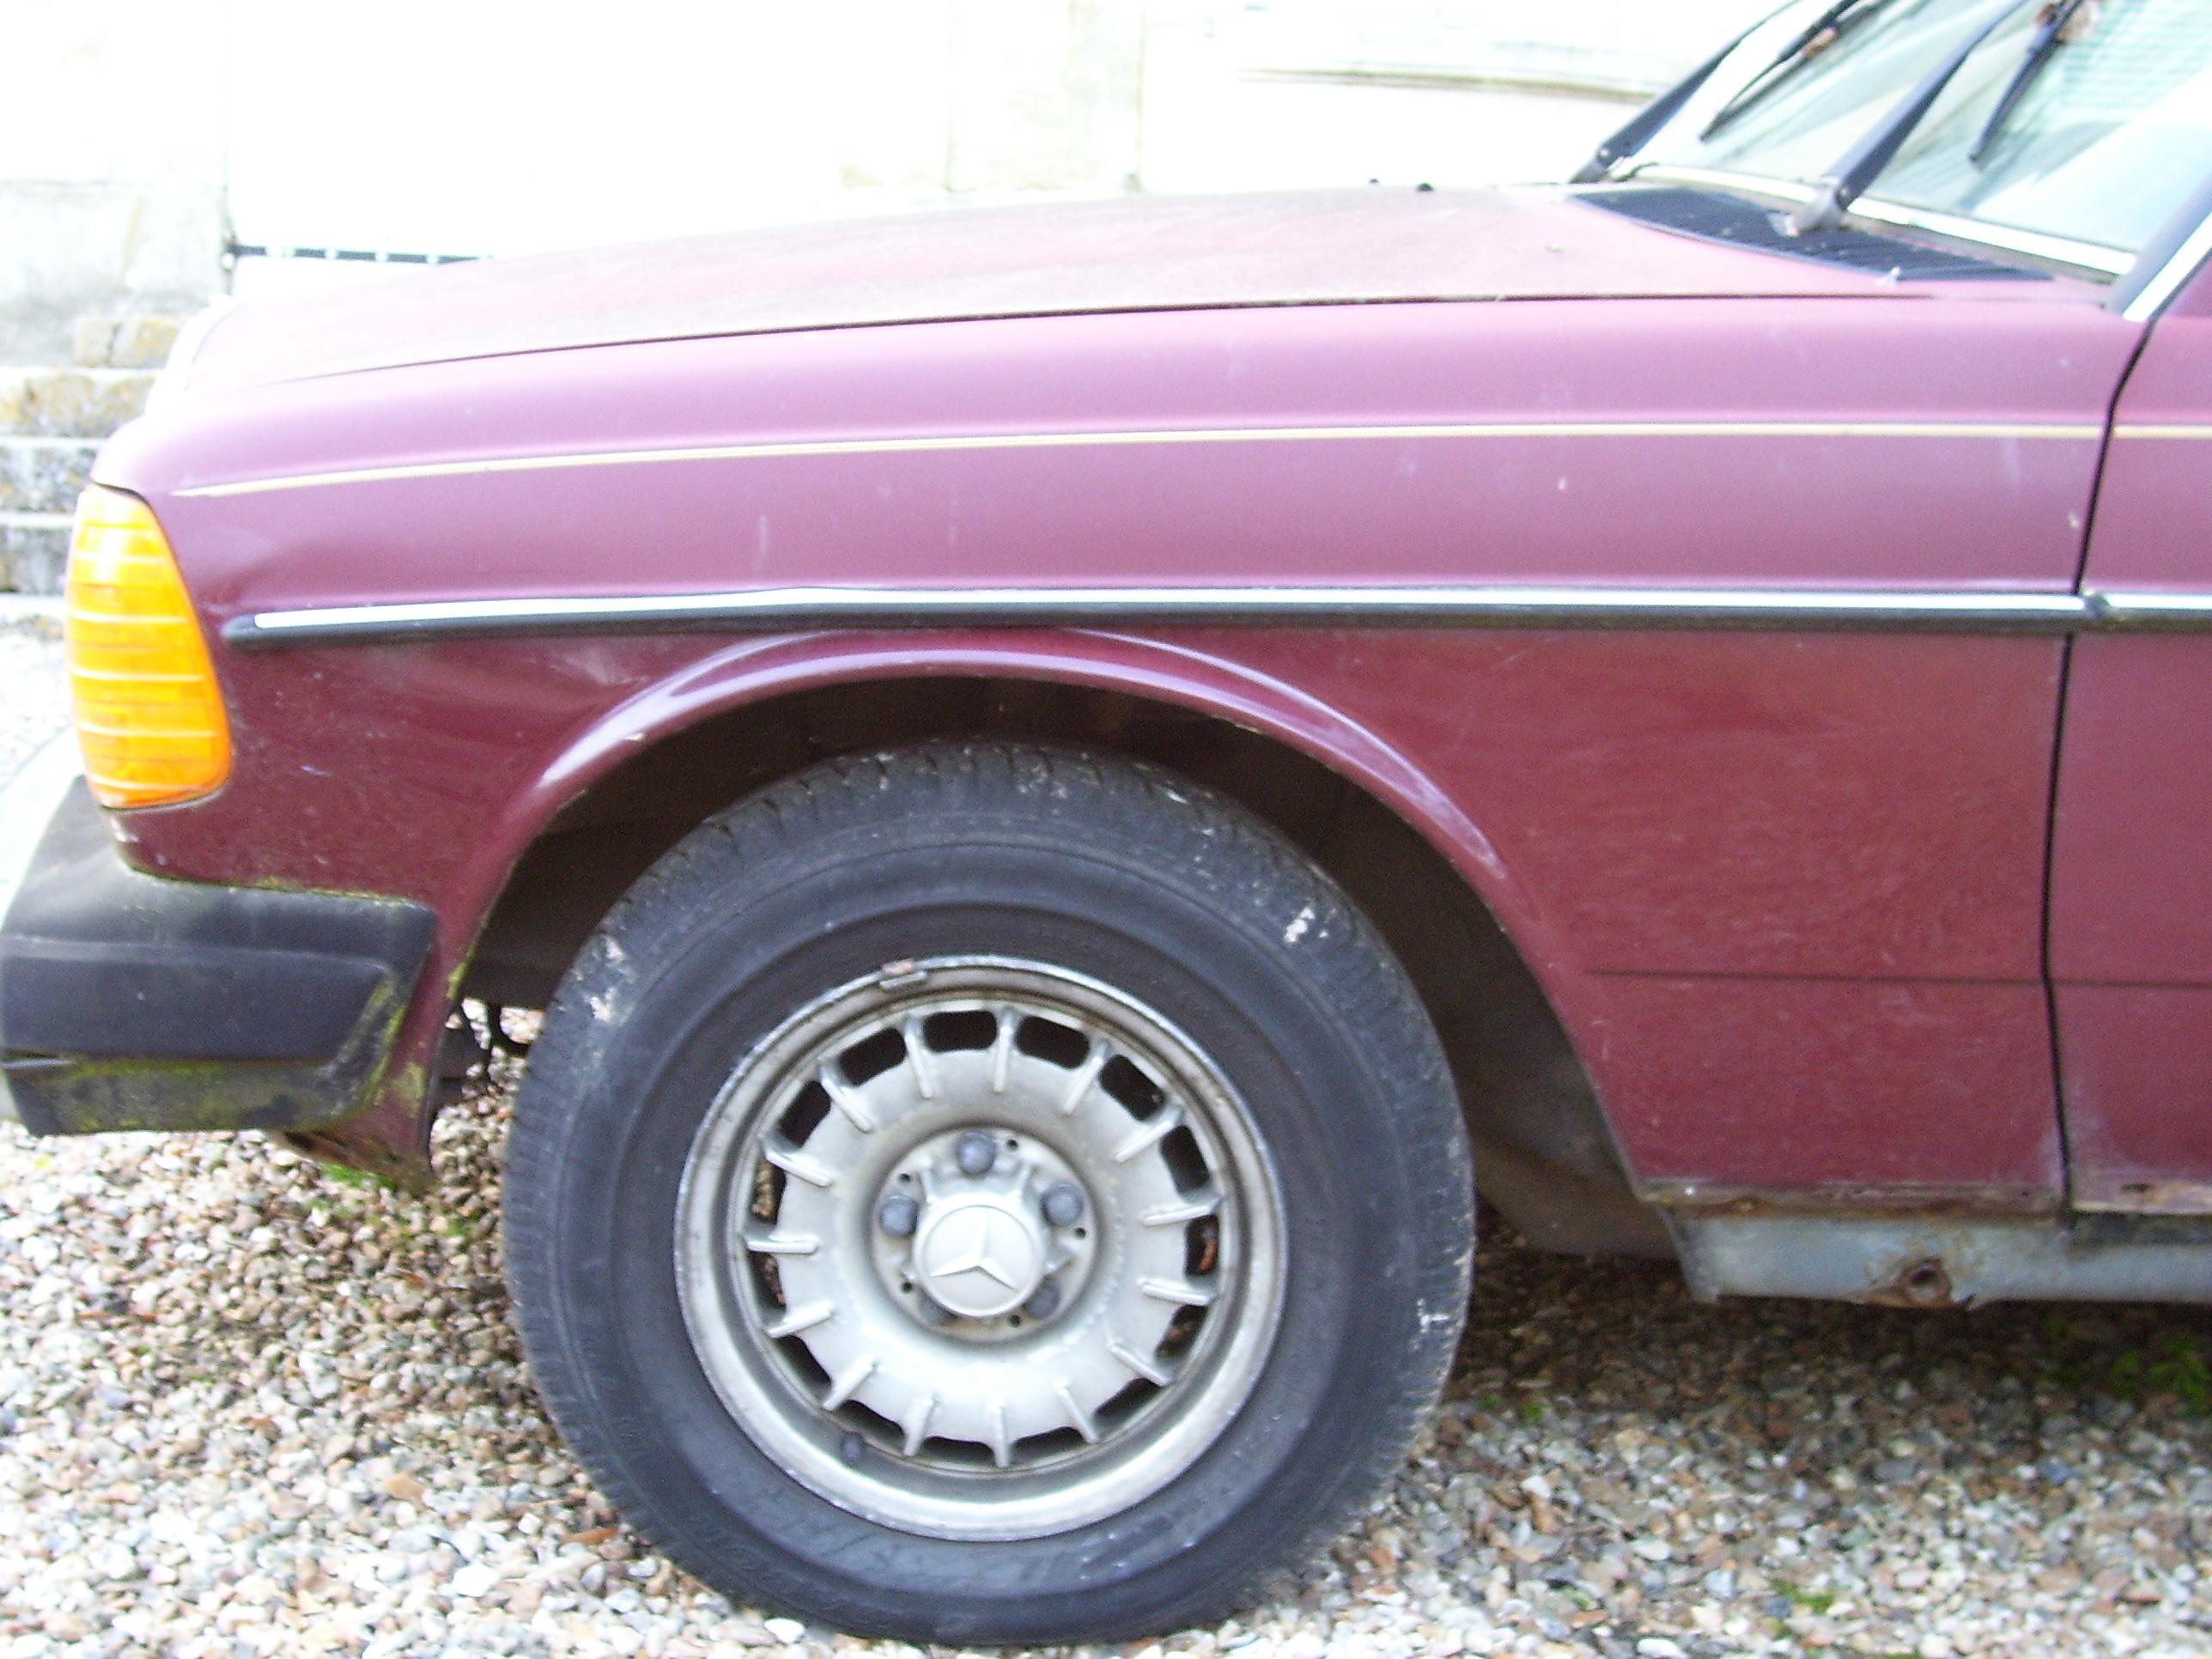 makkes vehicles land tire wheel mercedes car carkit side red